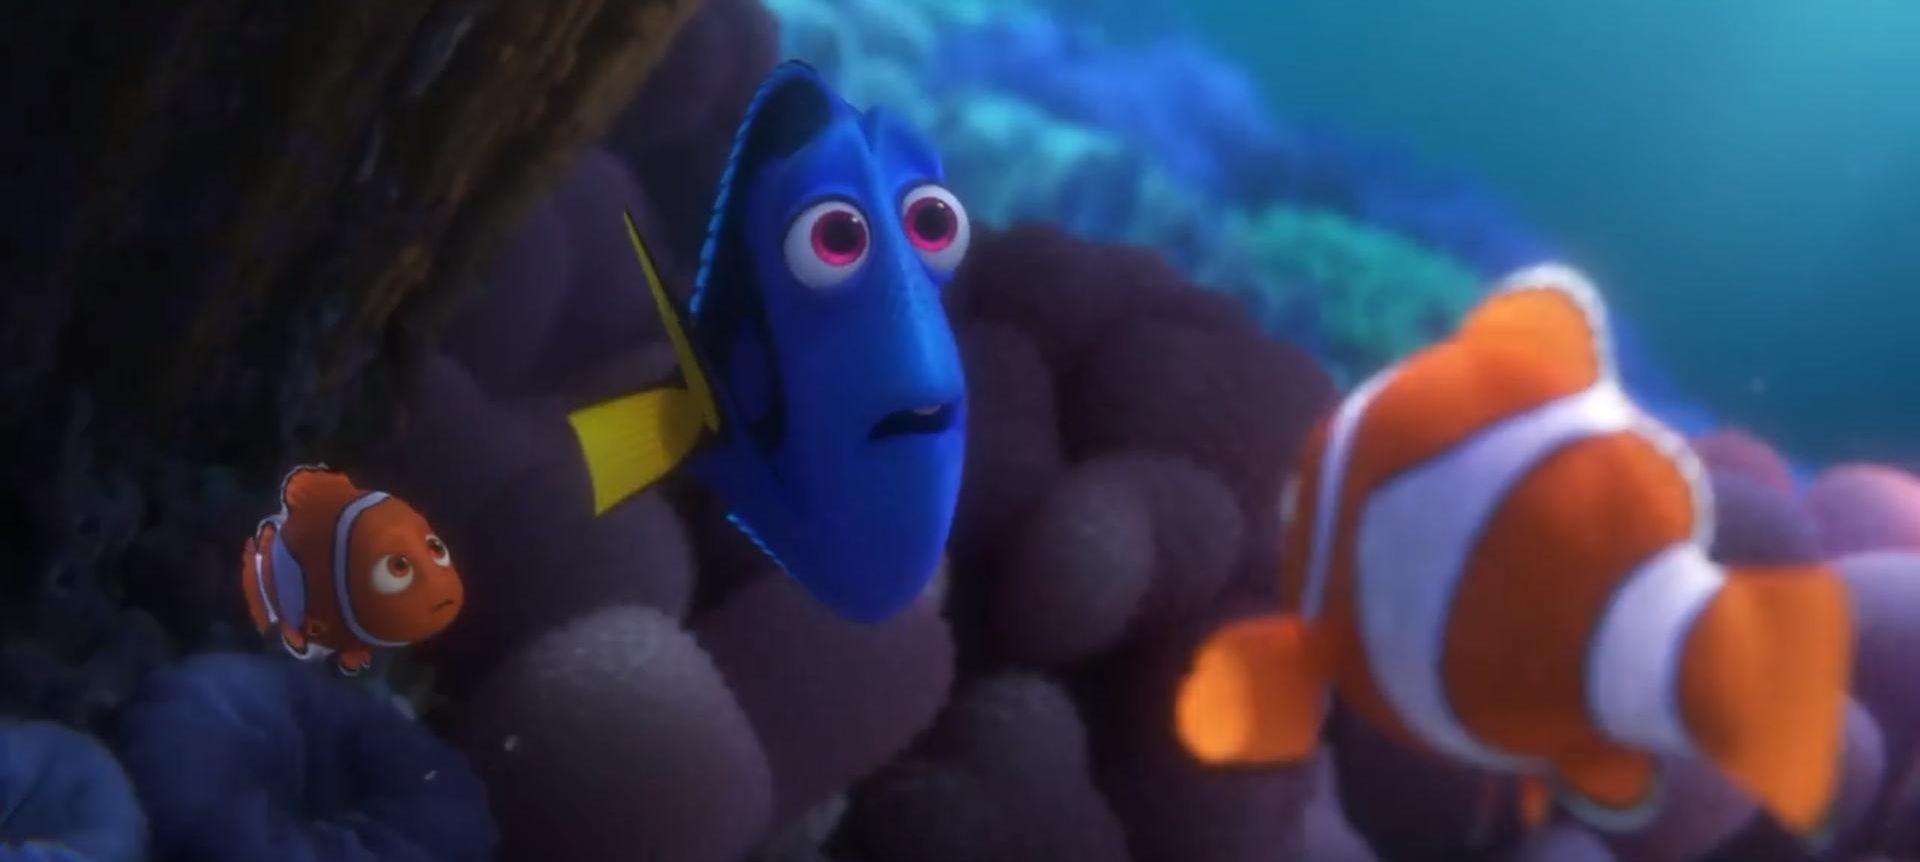 VIDEO: VRAĆA NAM SE ZABORAVNA DORY Pixar objavio puni trailer za 'Finding Dory'